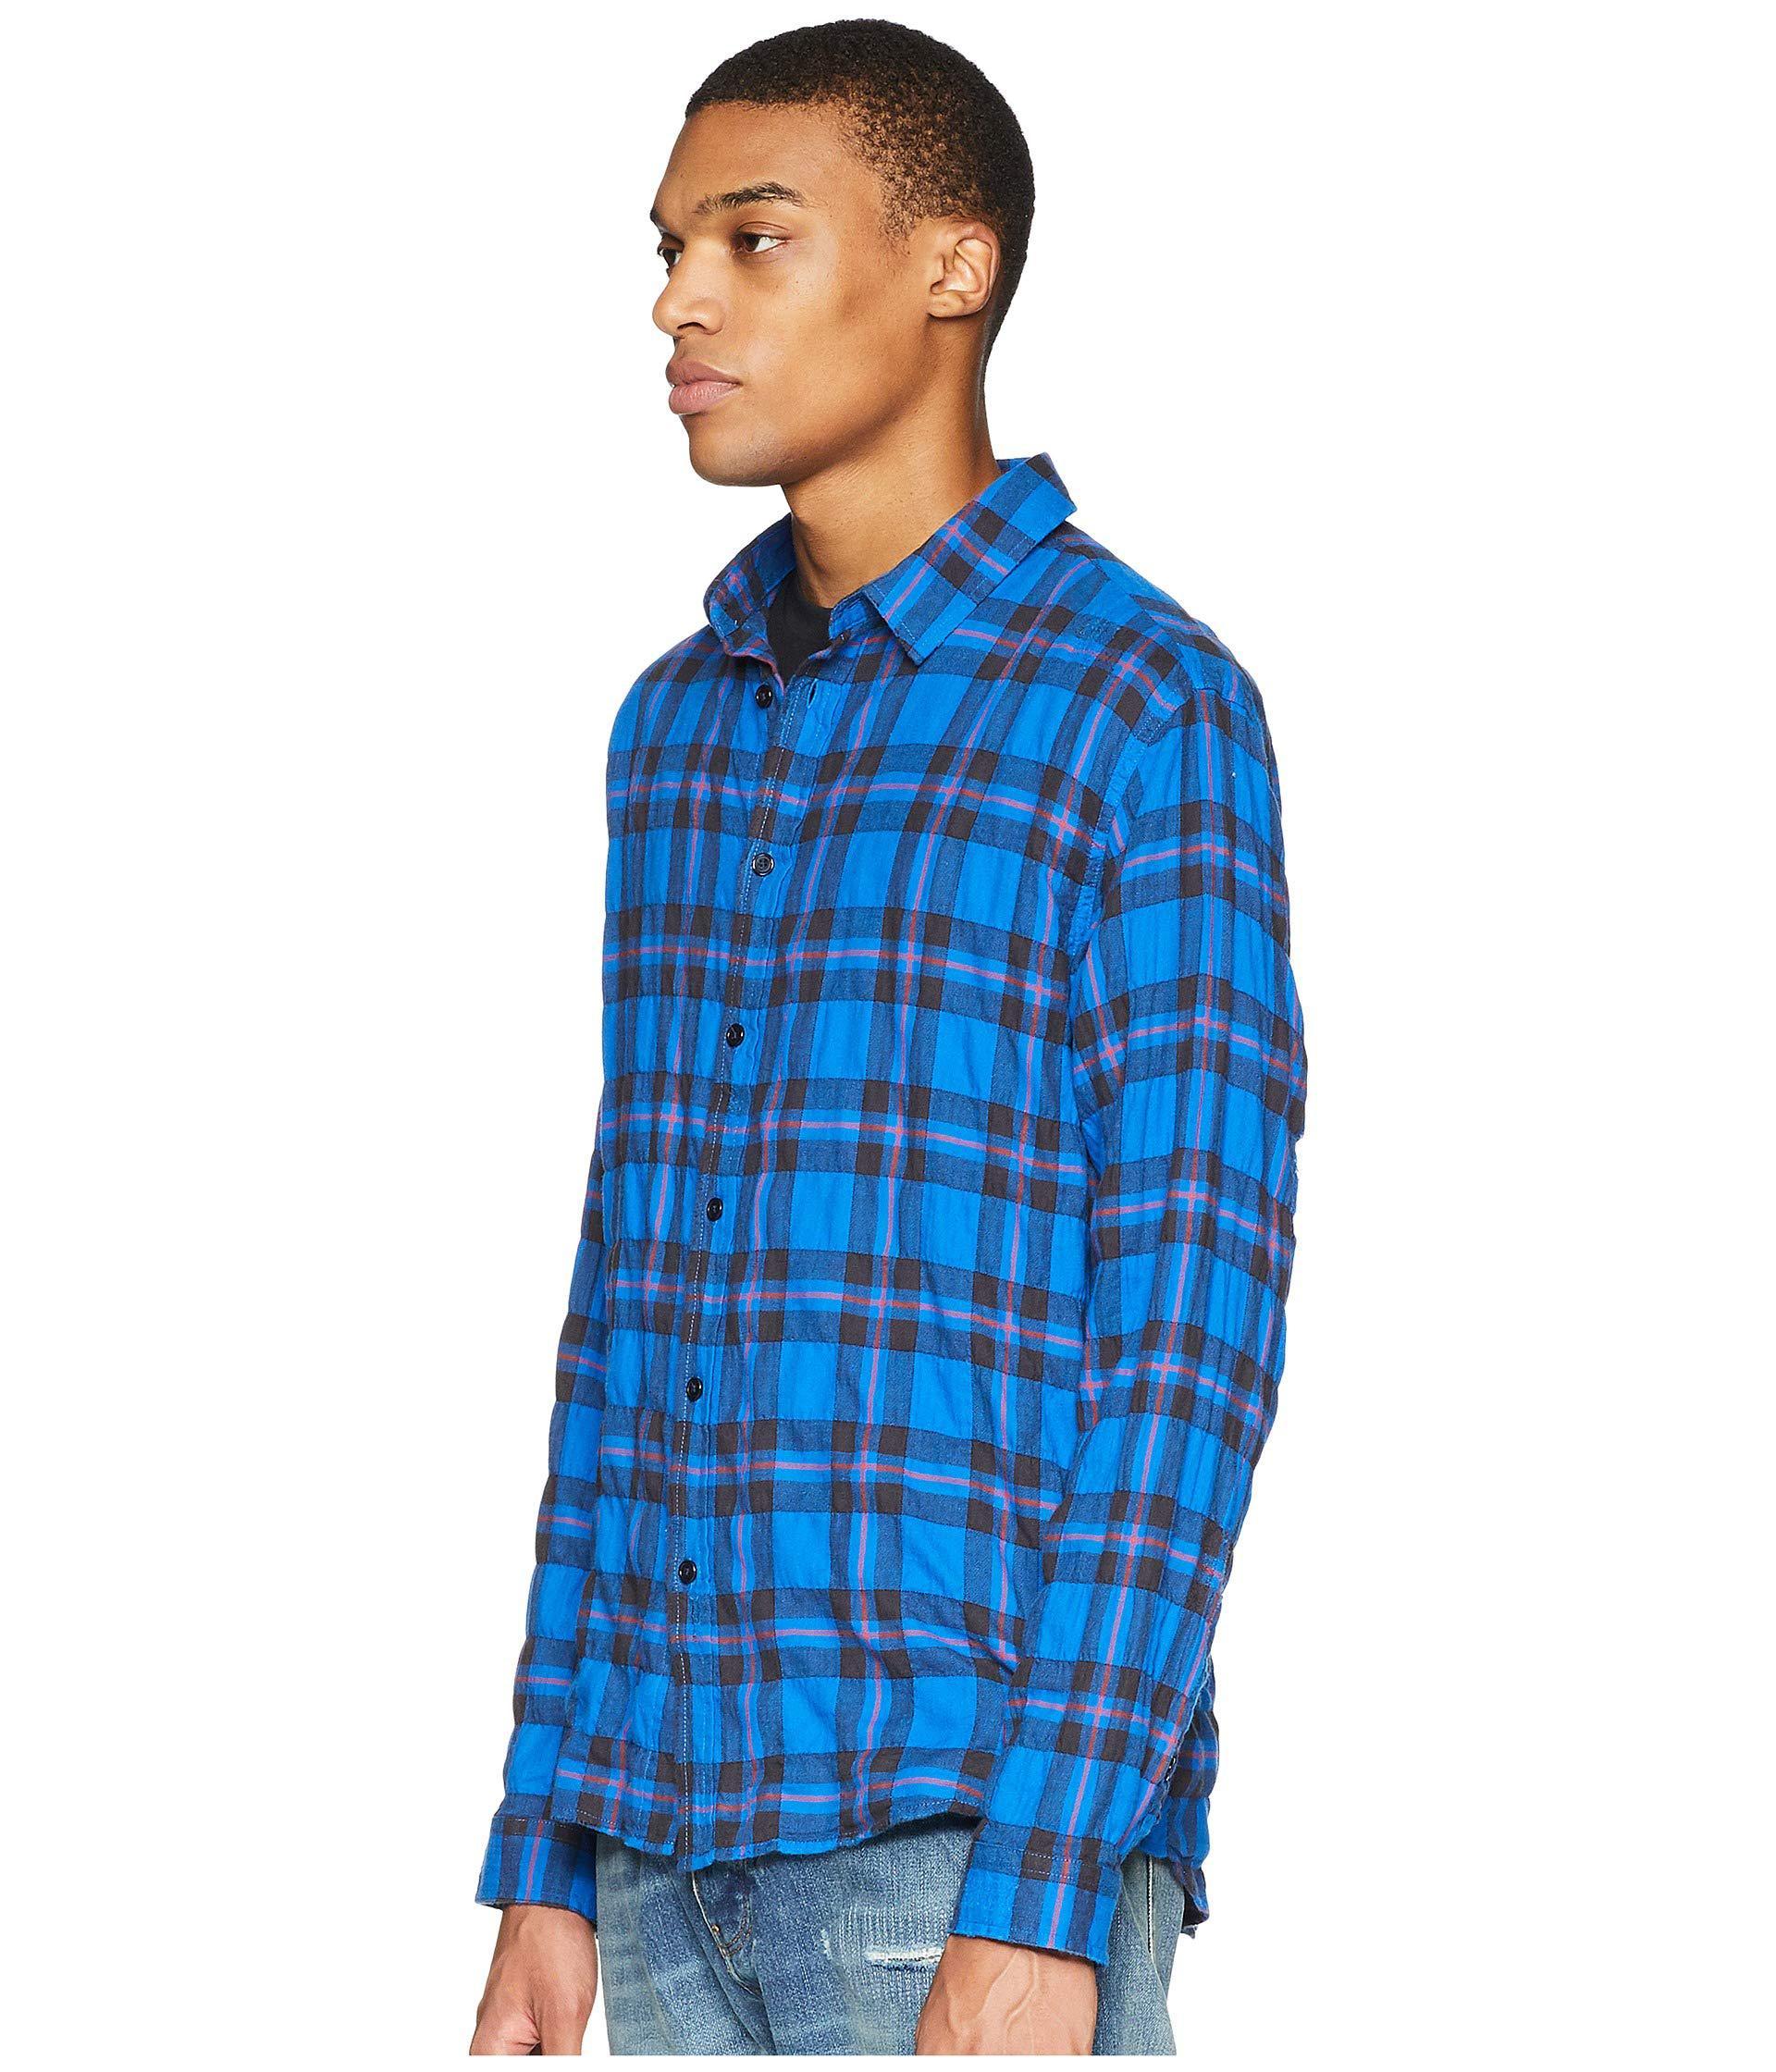 5f21c242b35 Lyst - The Kooples Buttoned Denim Shirt (blue) Men s Long Sleeve Button Up  in Blue for Men